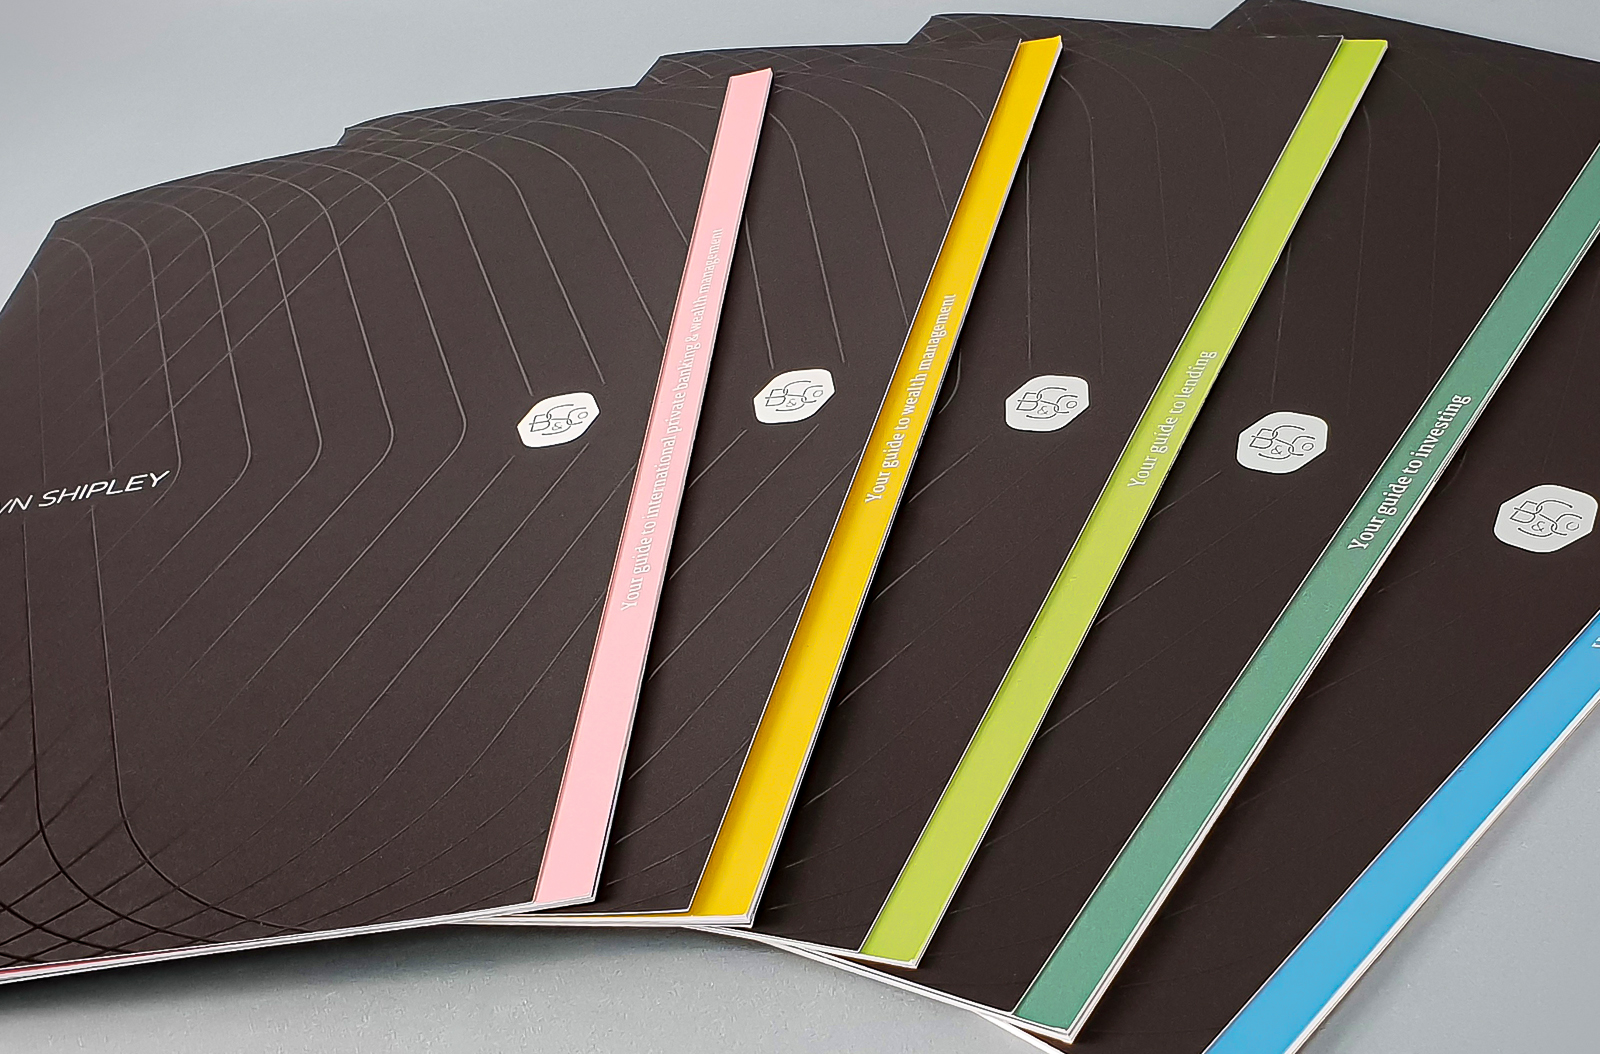 Brown Shipley Brochures